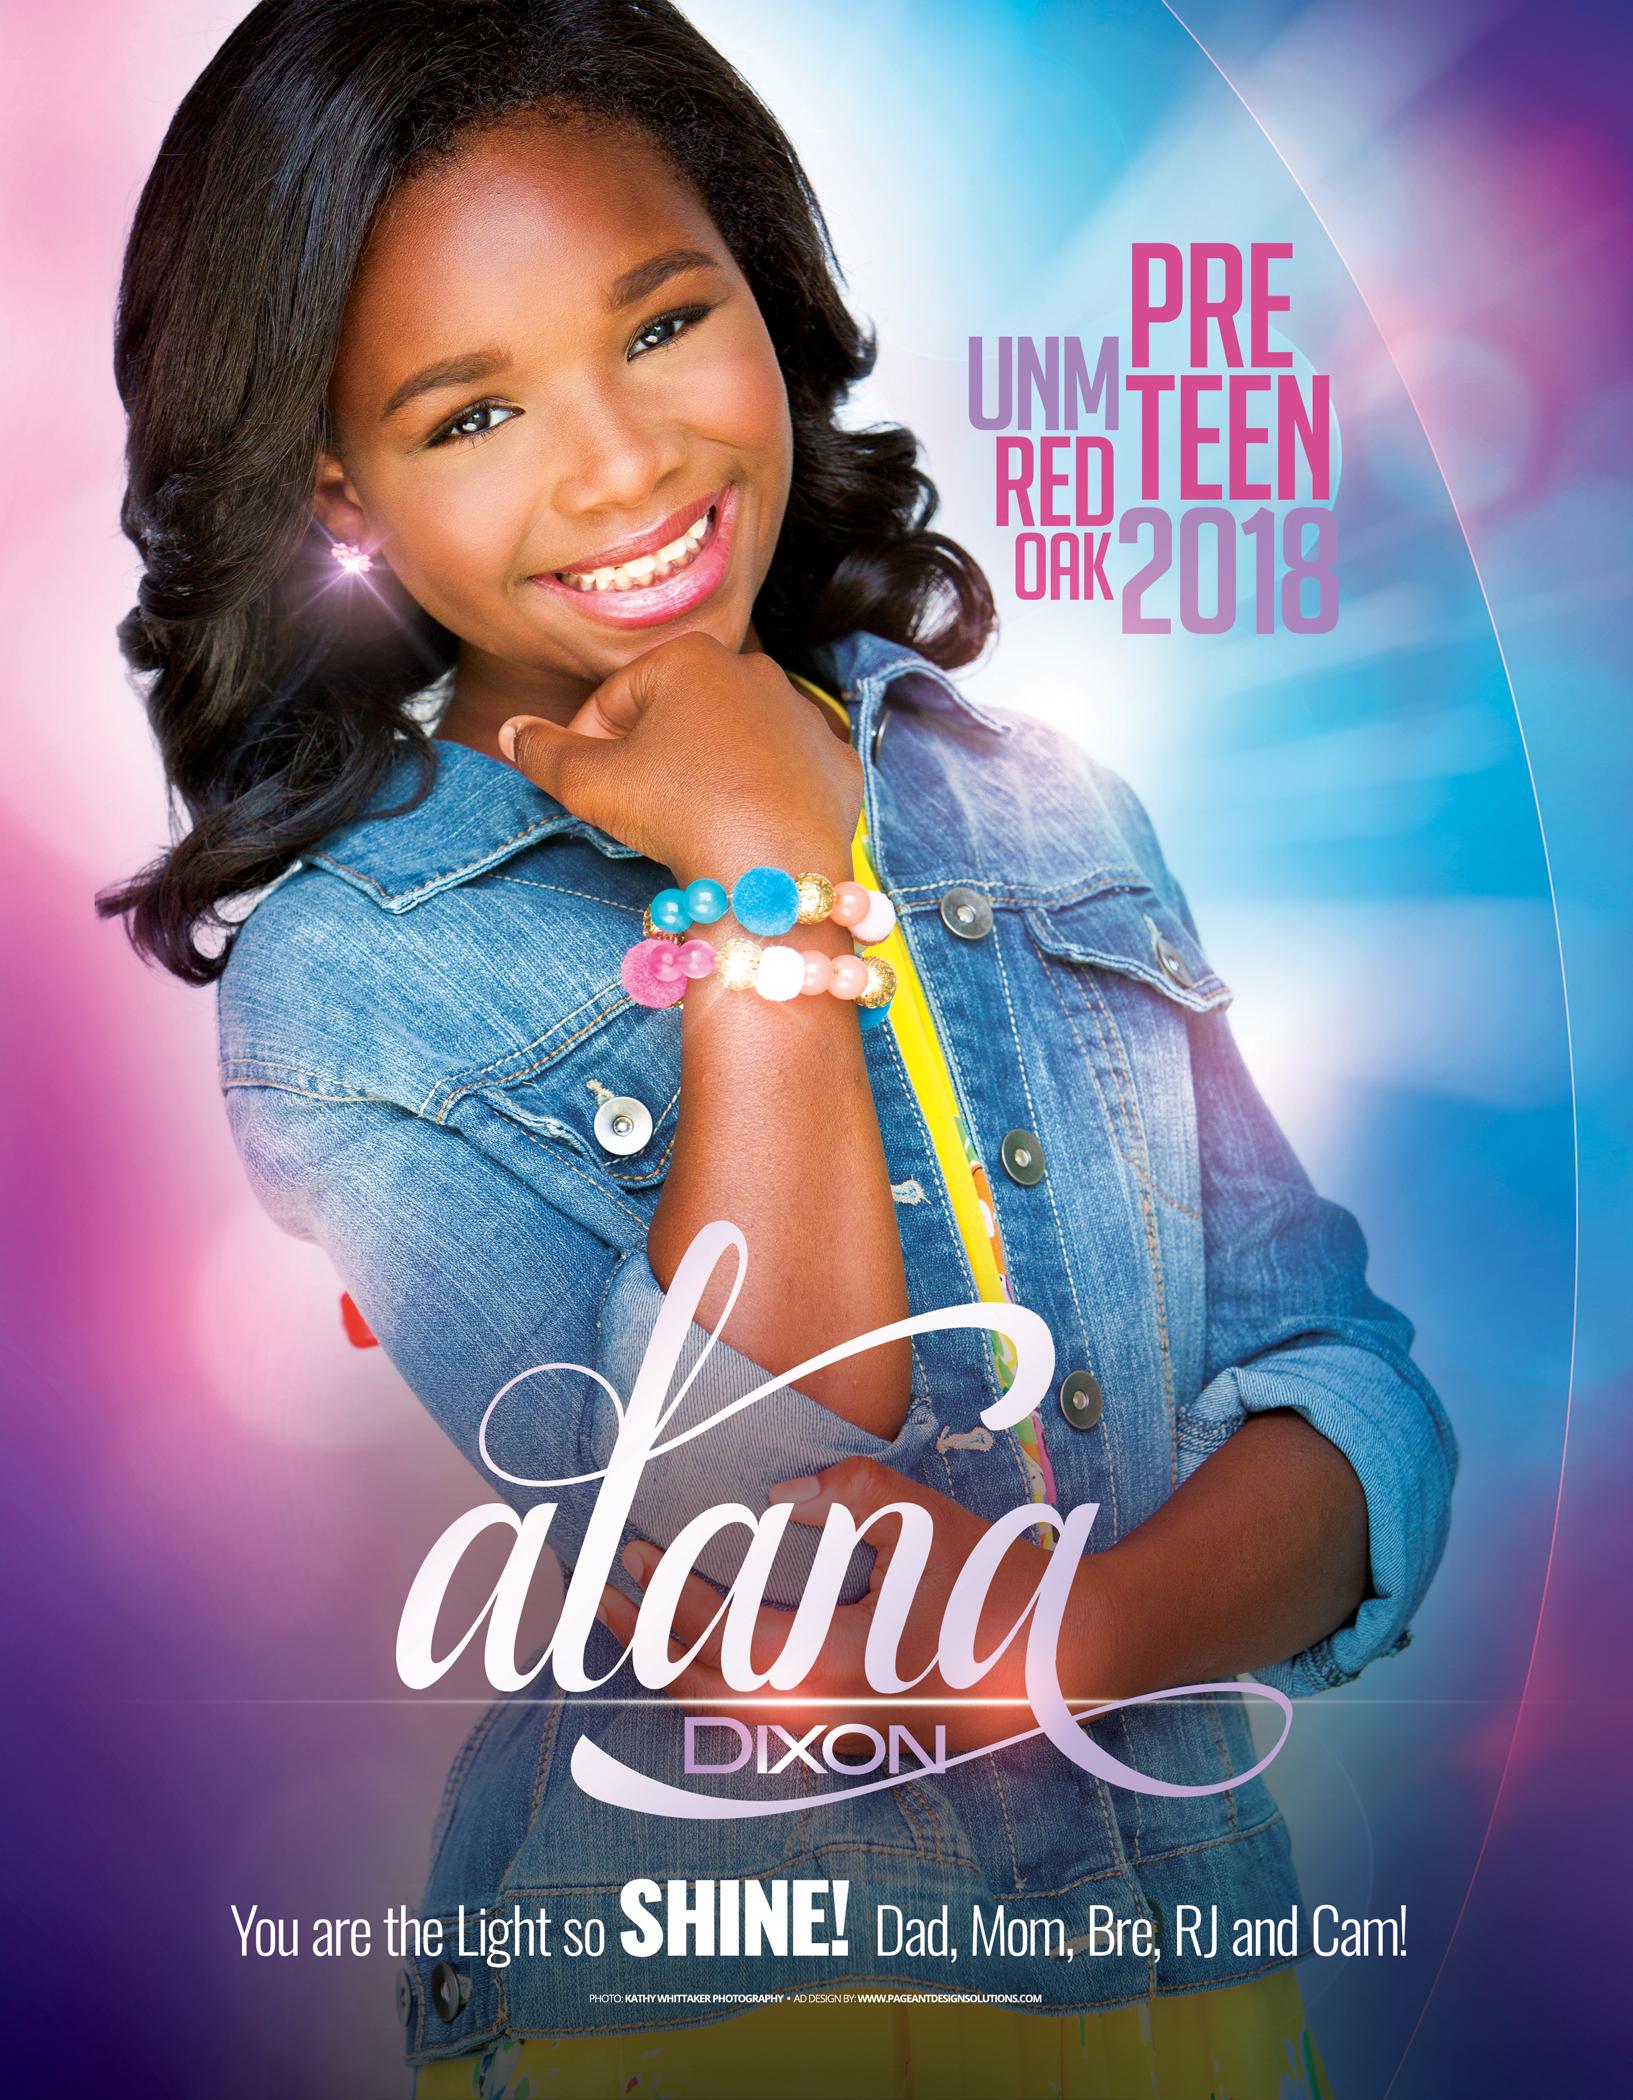 Dixon, Alana AD 300dpi CMYK FULL BLEED 8